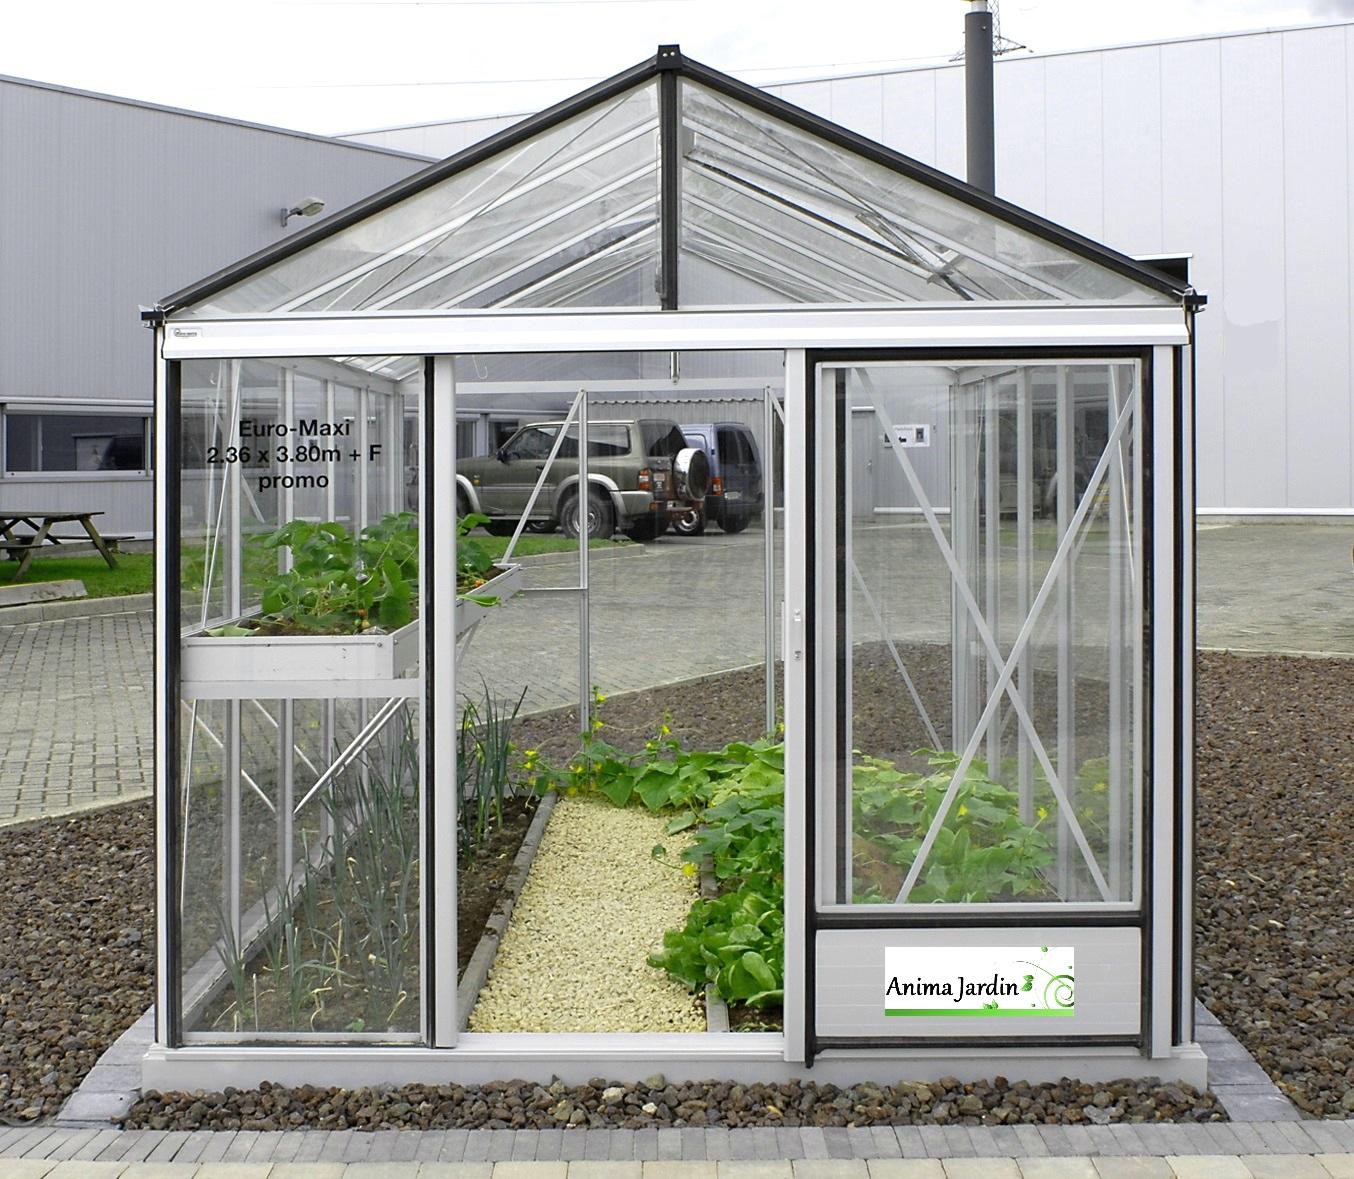 Serre Jardin horticole, 7.30 m2, en verre trempé, Aluminium, serre euro  maxi, achat